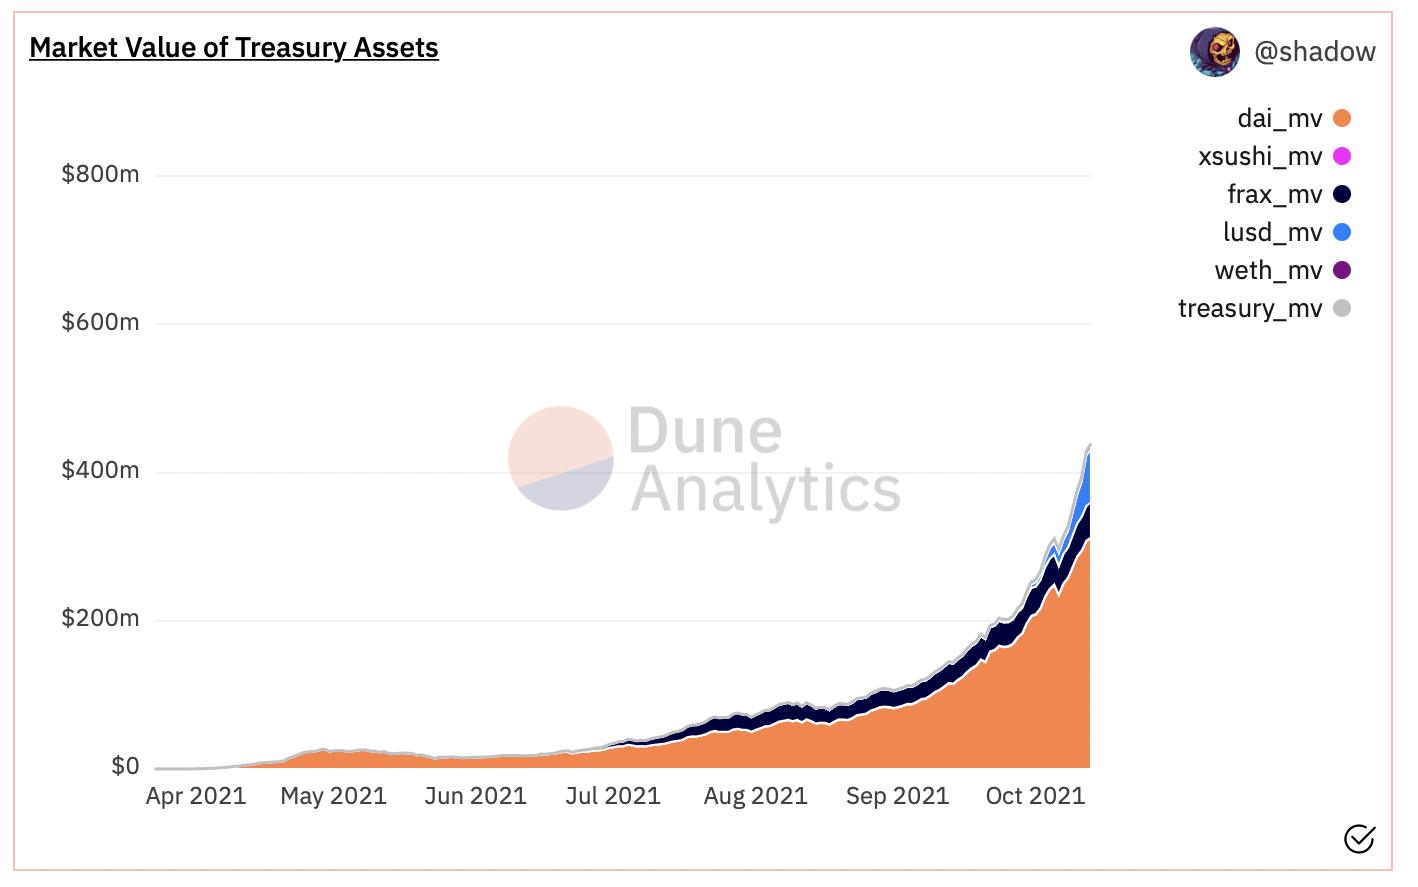 Market value of treasury assets - OHM